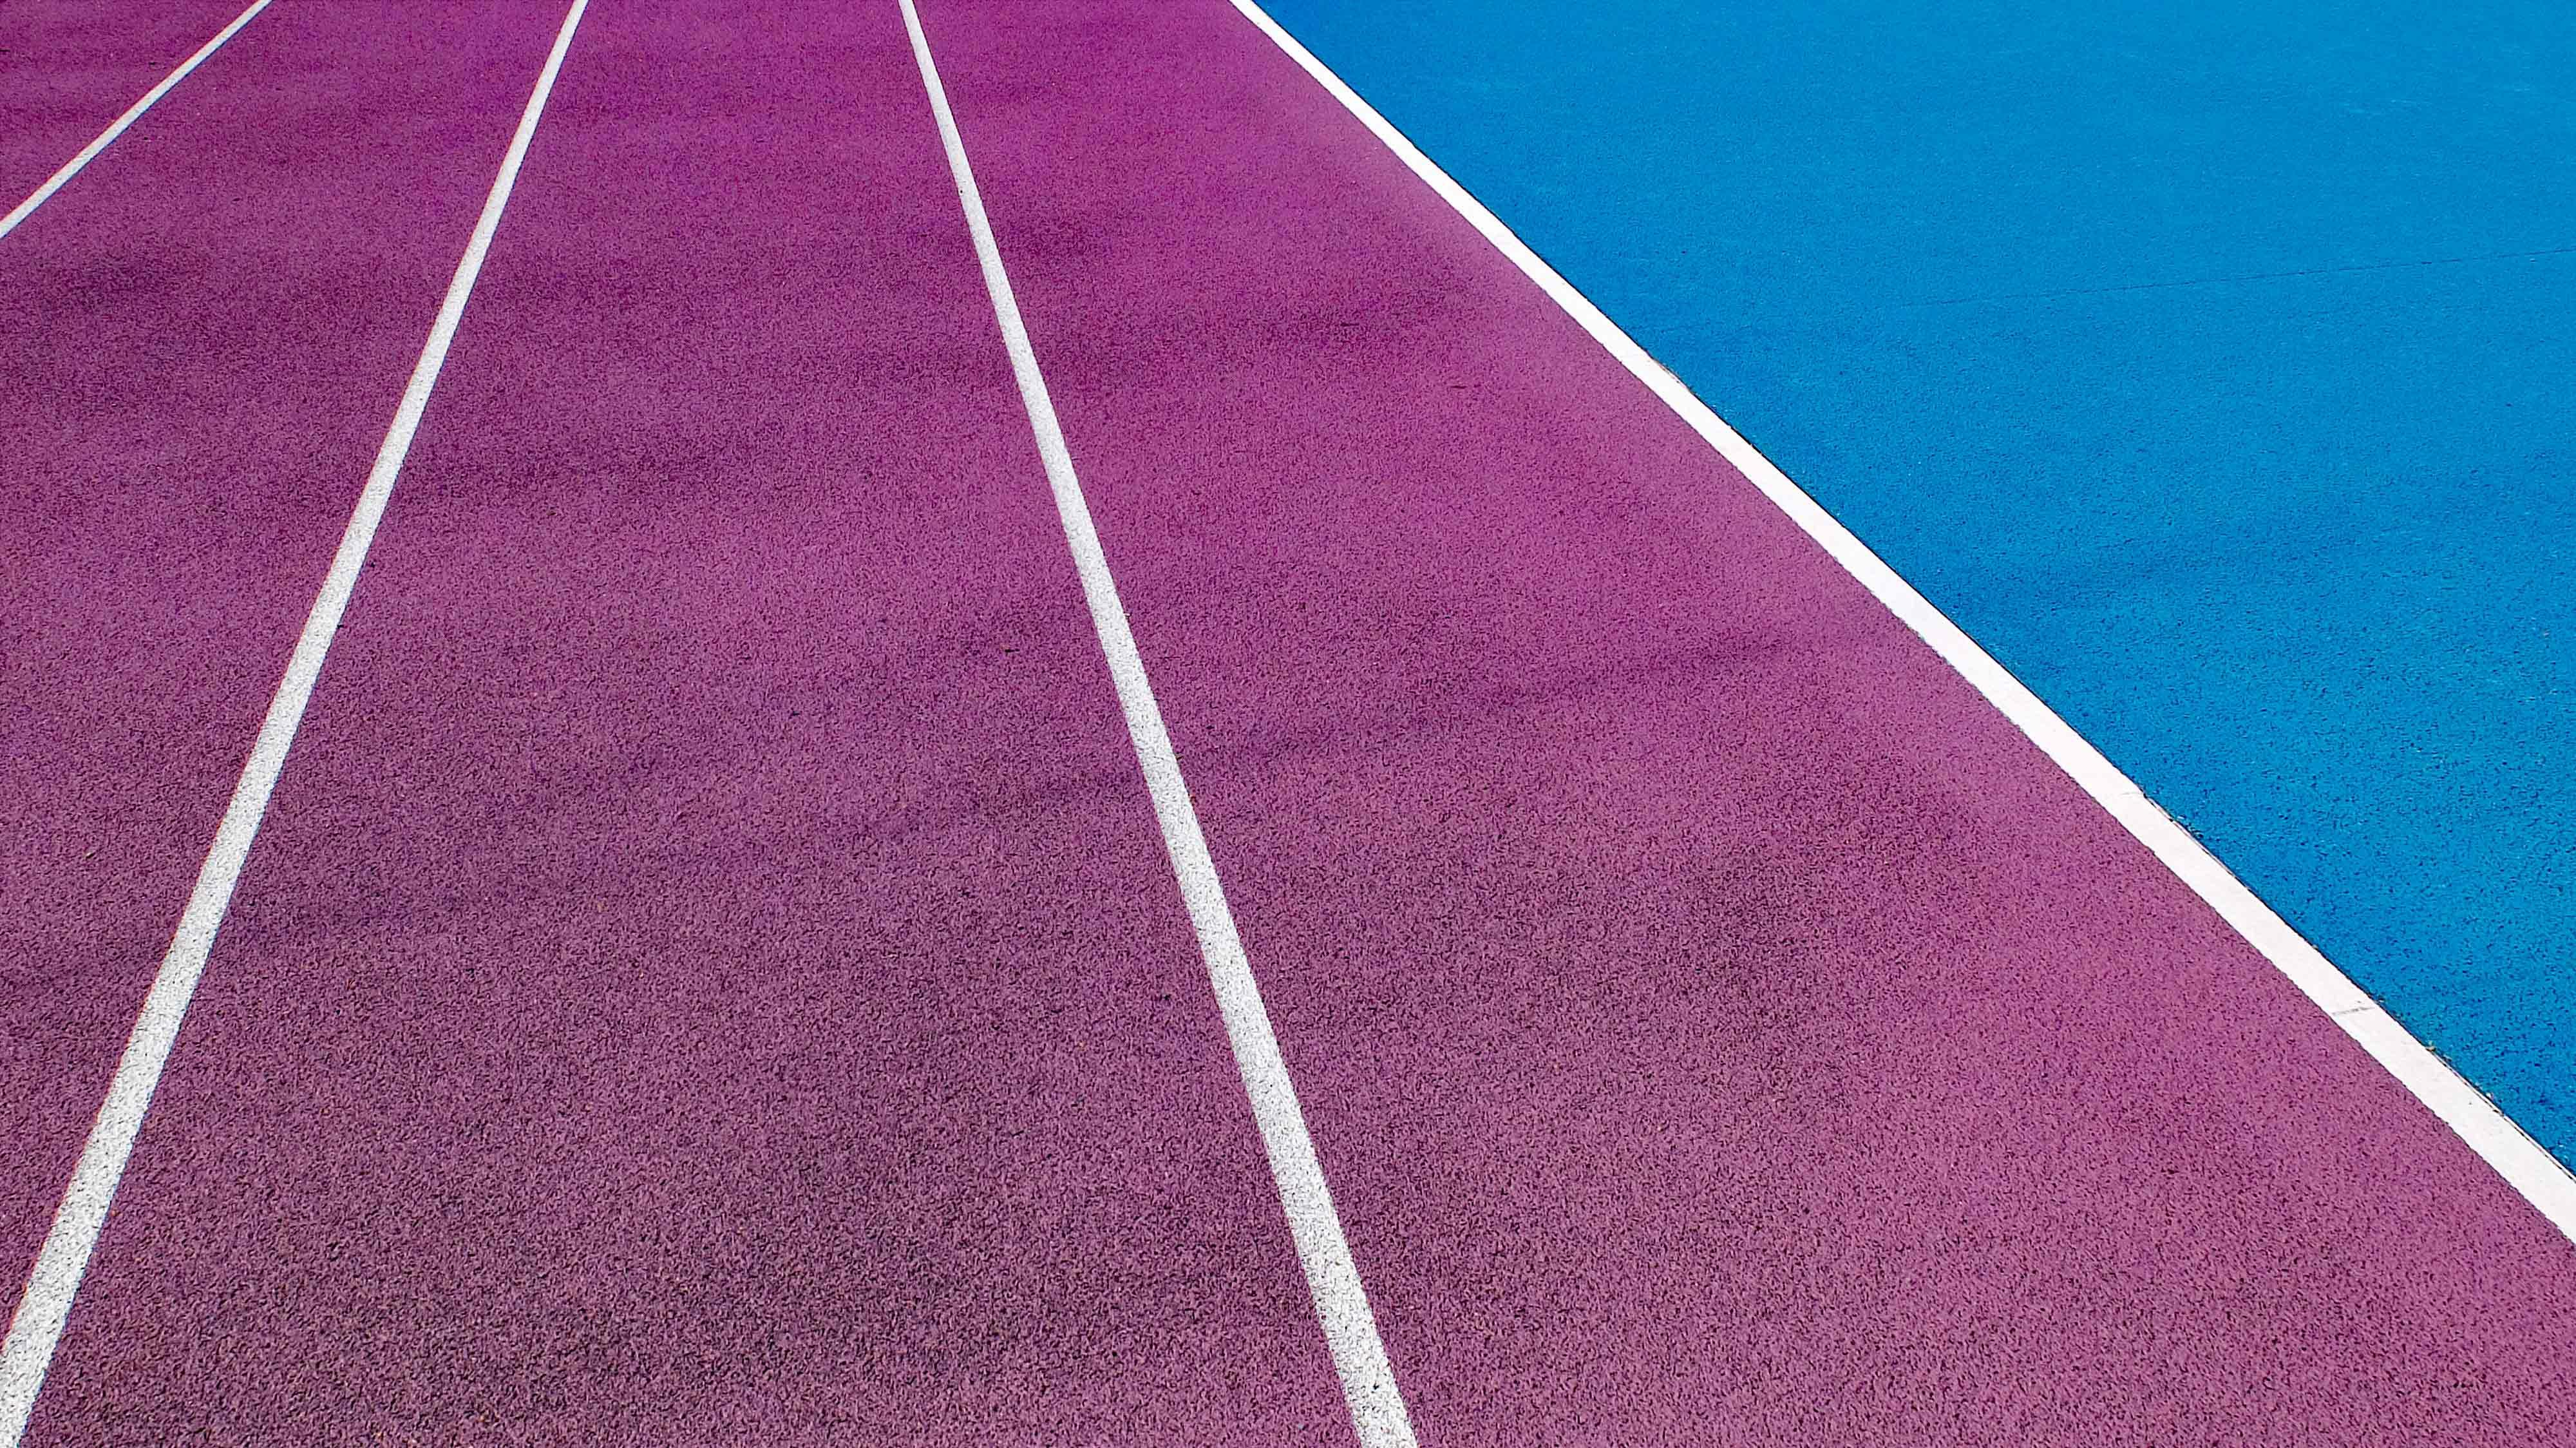 sport-2006906